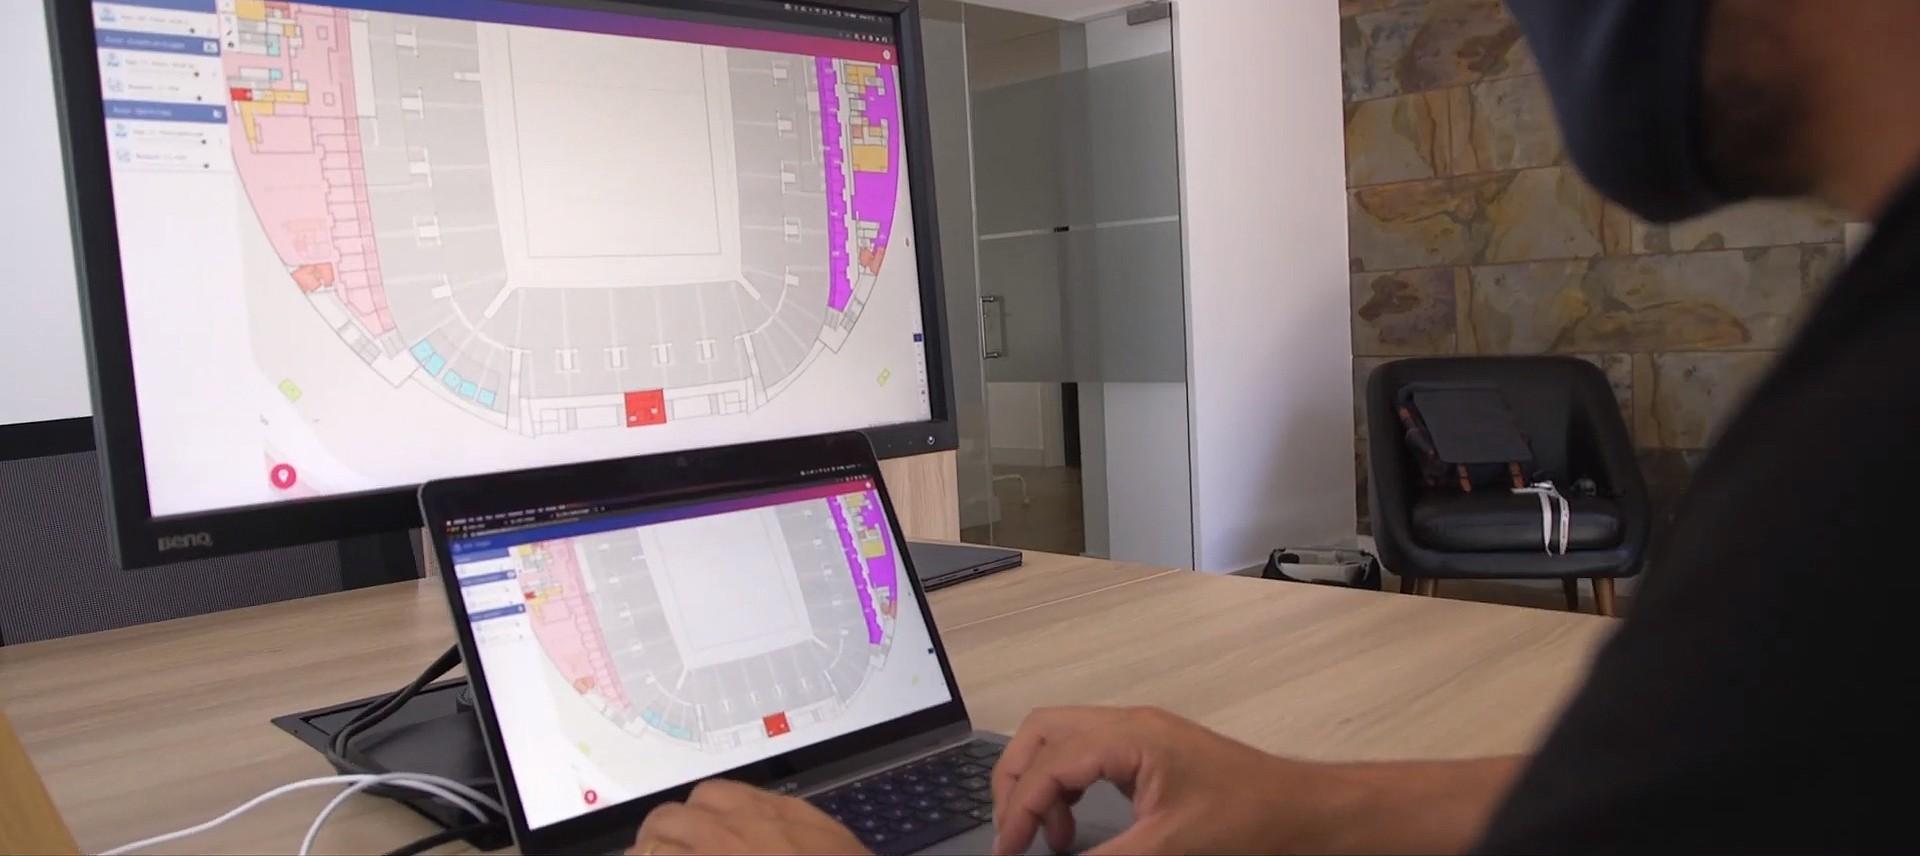 UEFA's new VISTA system for stadium operation